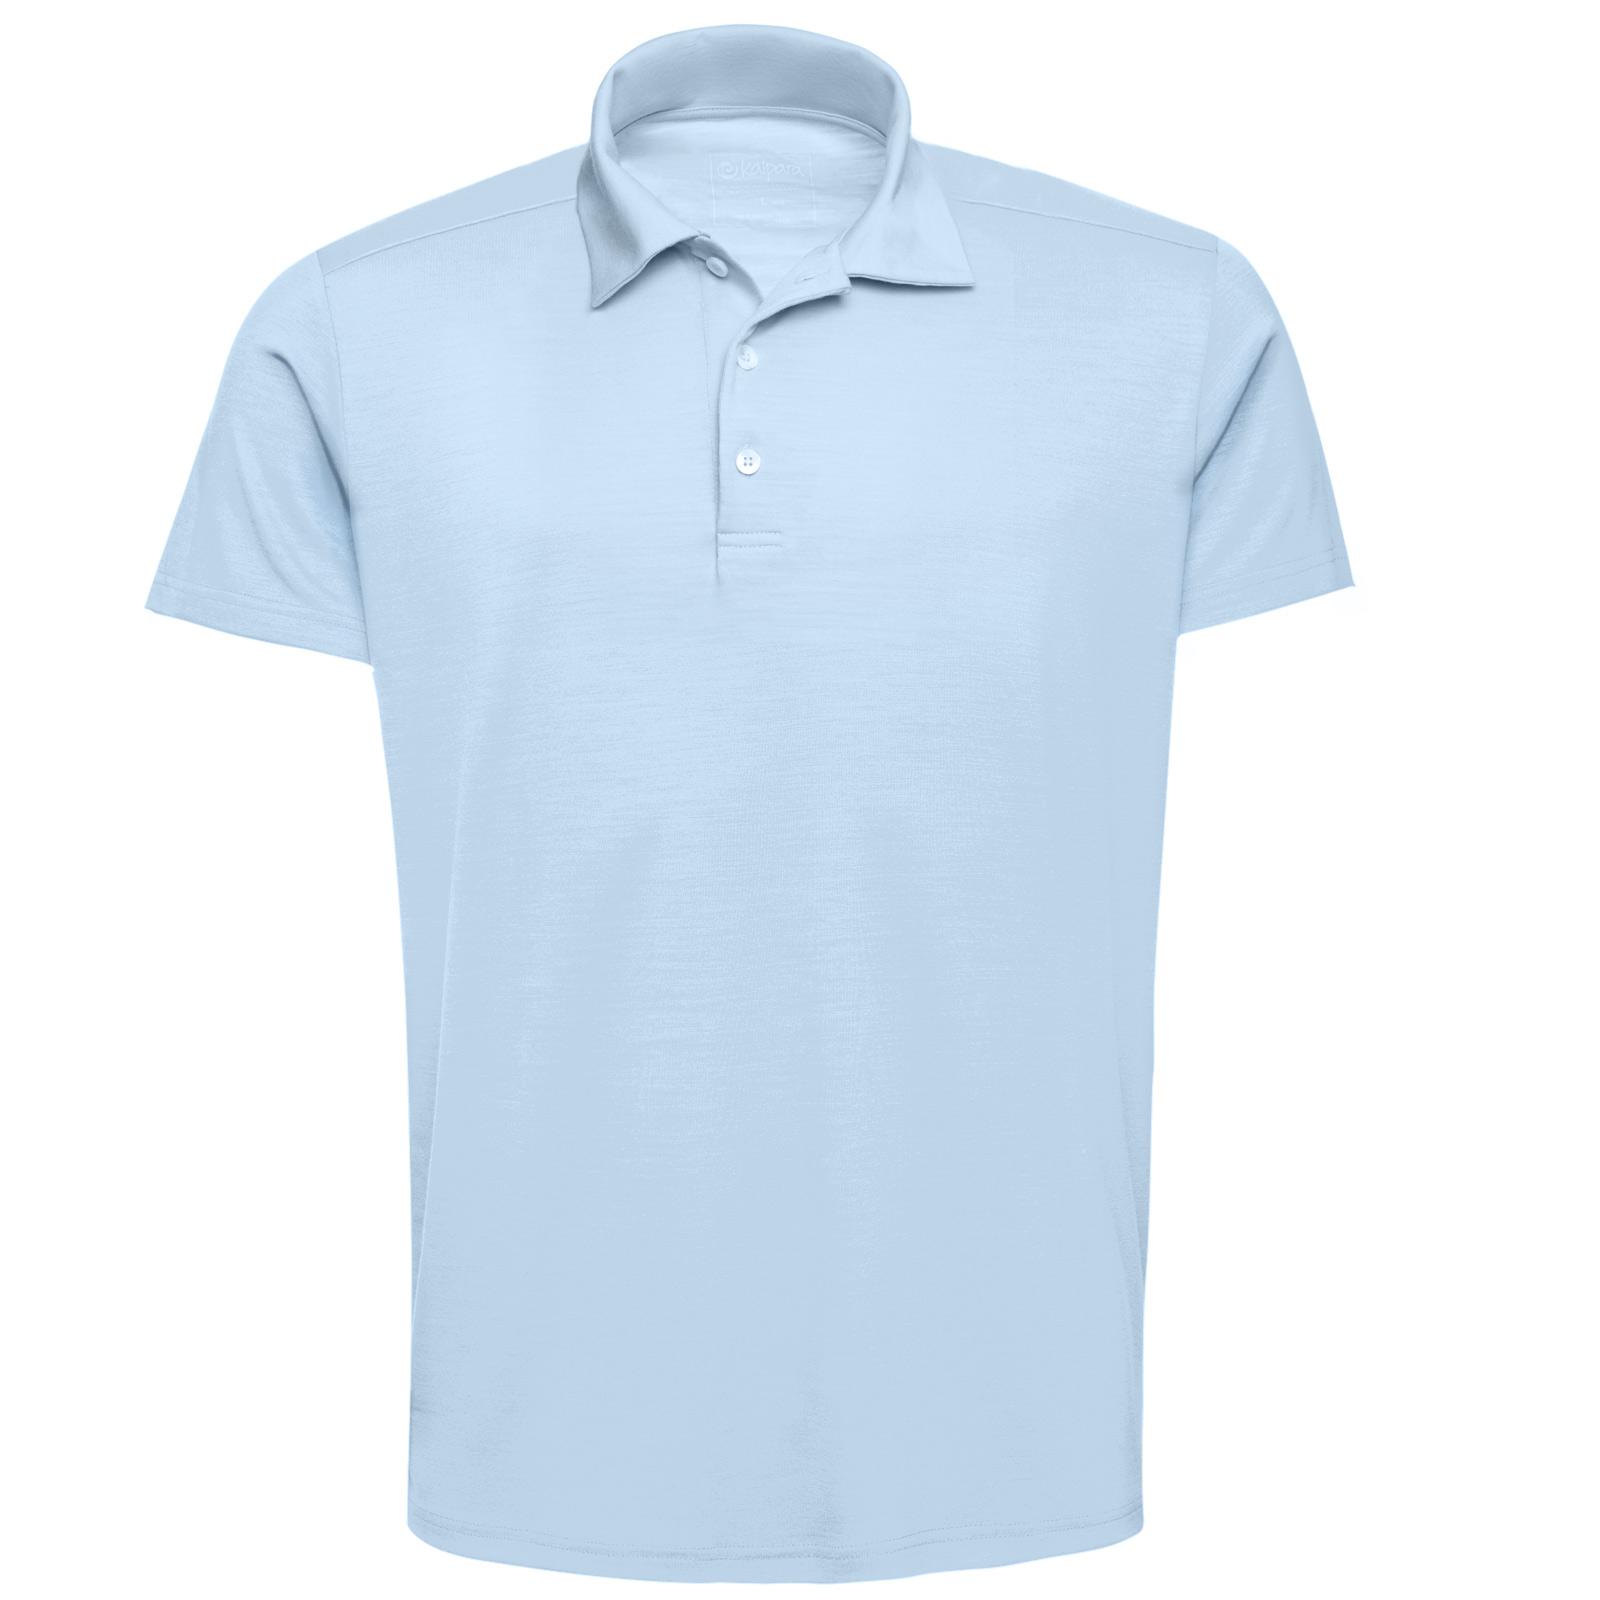 URBAN LIMITED Merino Poloshirt Herren Kurzarm Regular 200 Crystal-Blue L